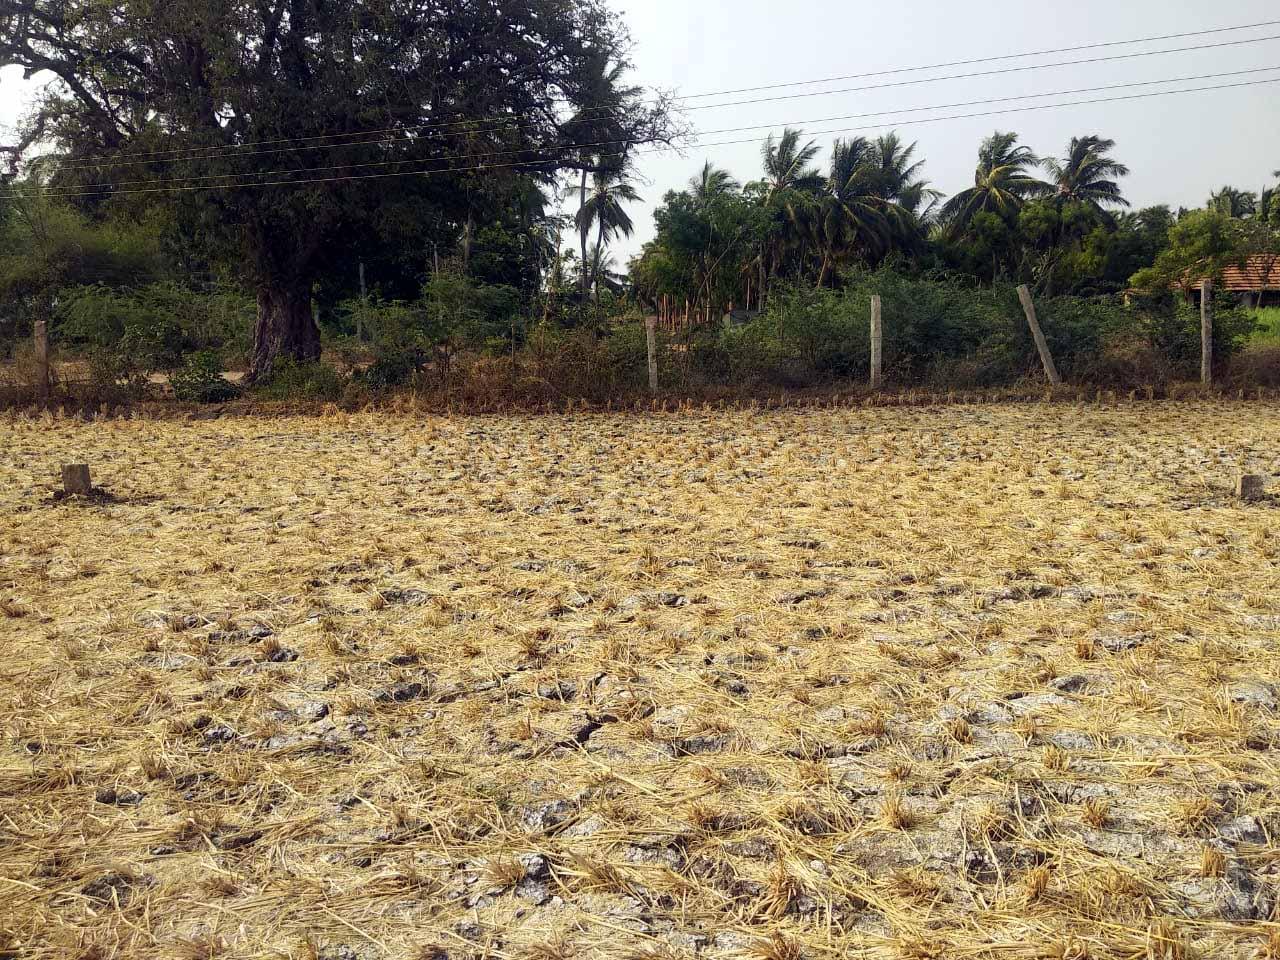 Agriculture Land For Sale in Vathiyur, Tamil Nadu | SFarmsIndia com